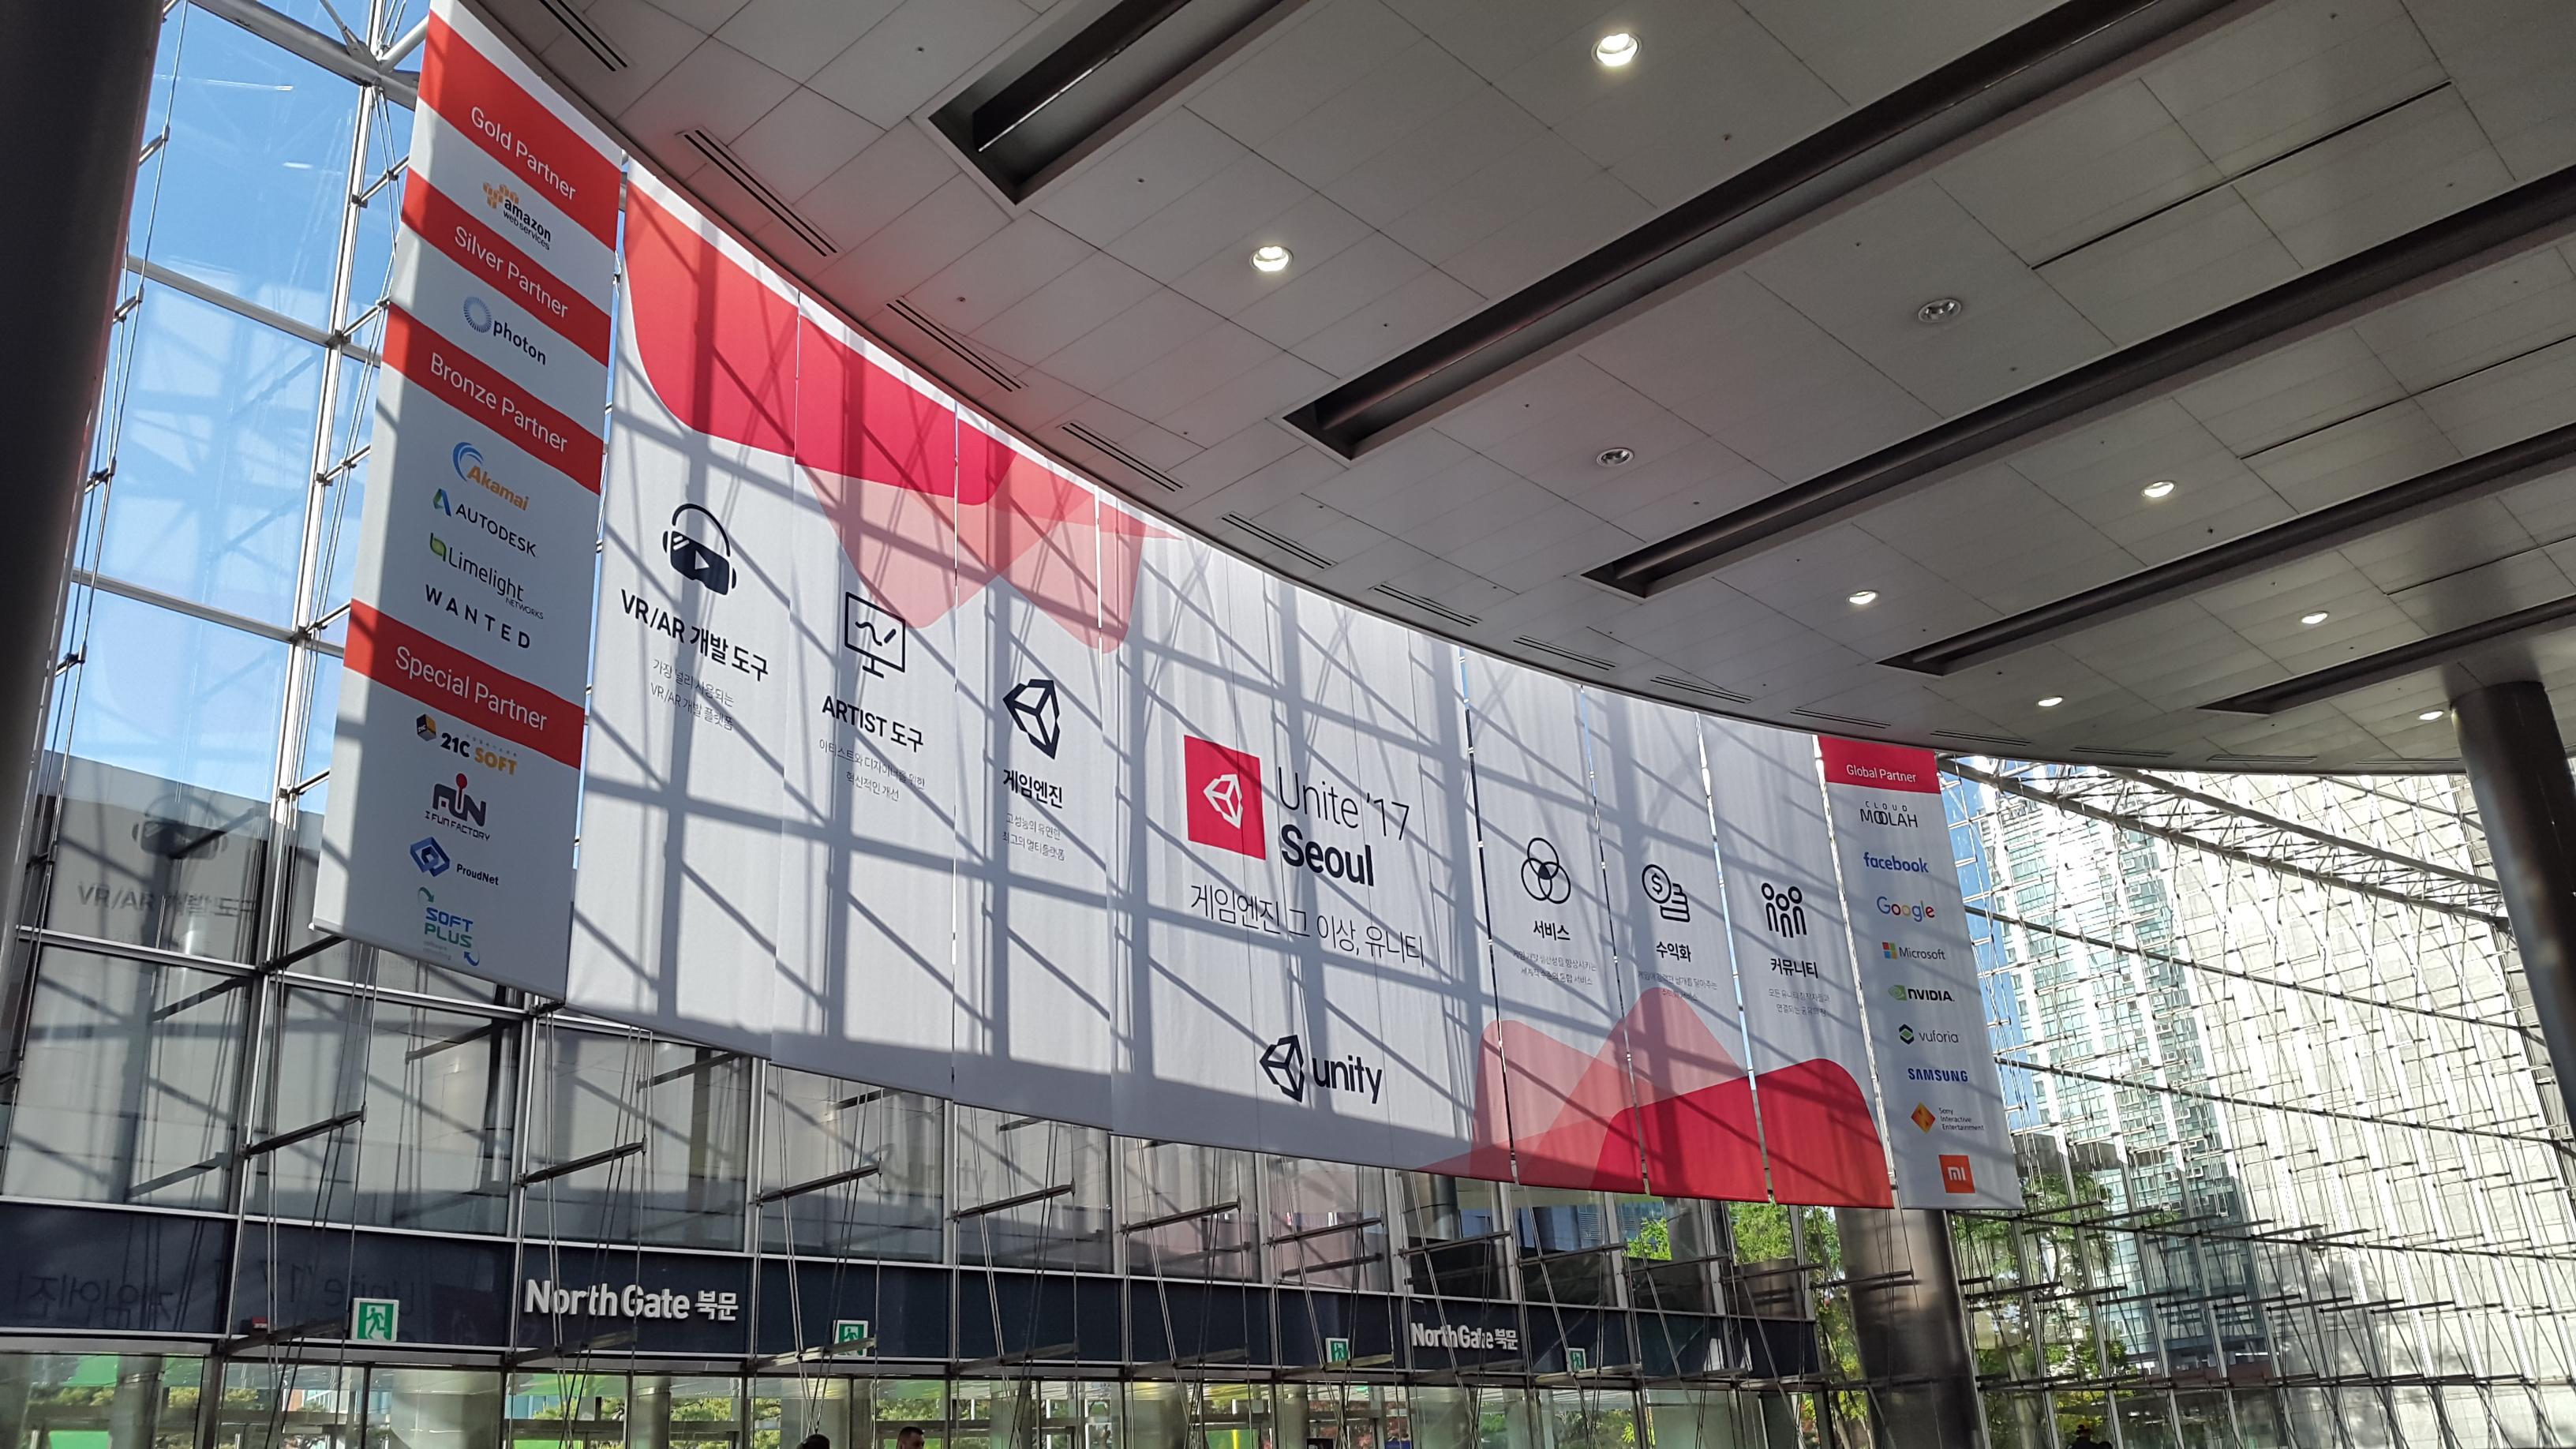 Unite '17 Seoul